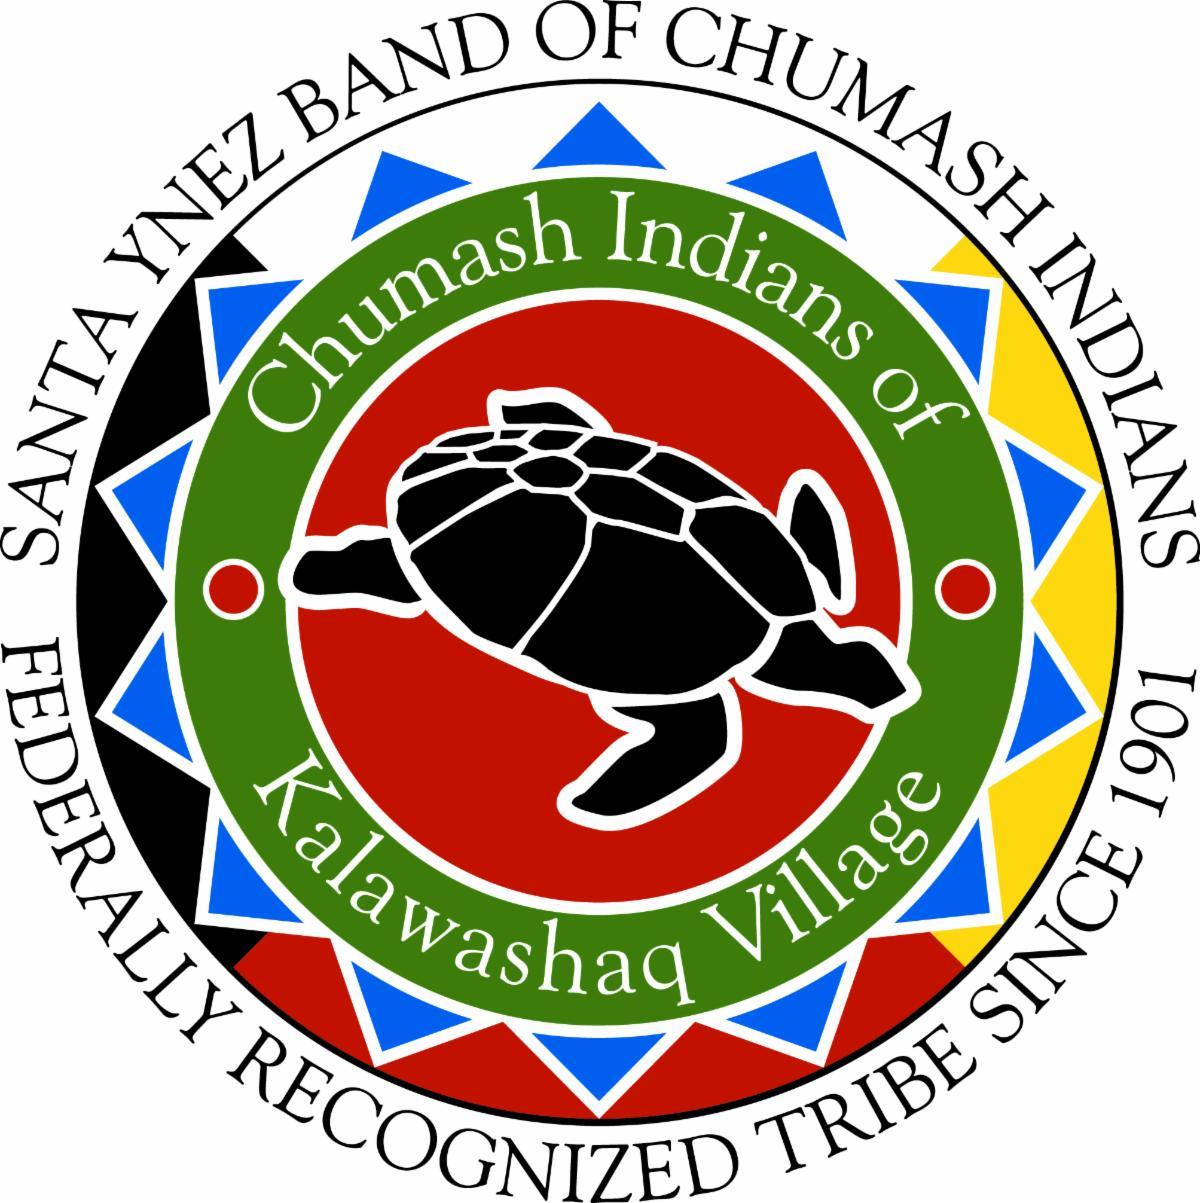 tribal logo 4c-1.jpg